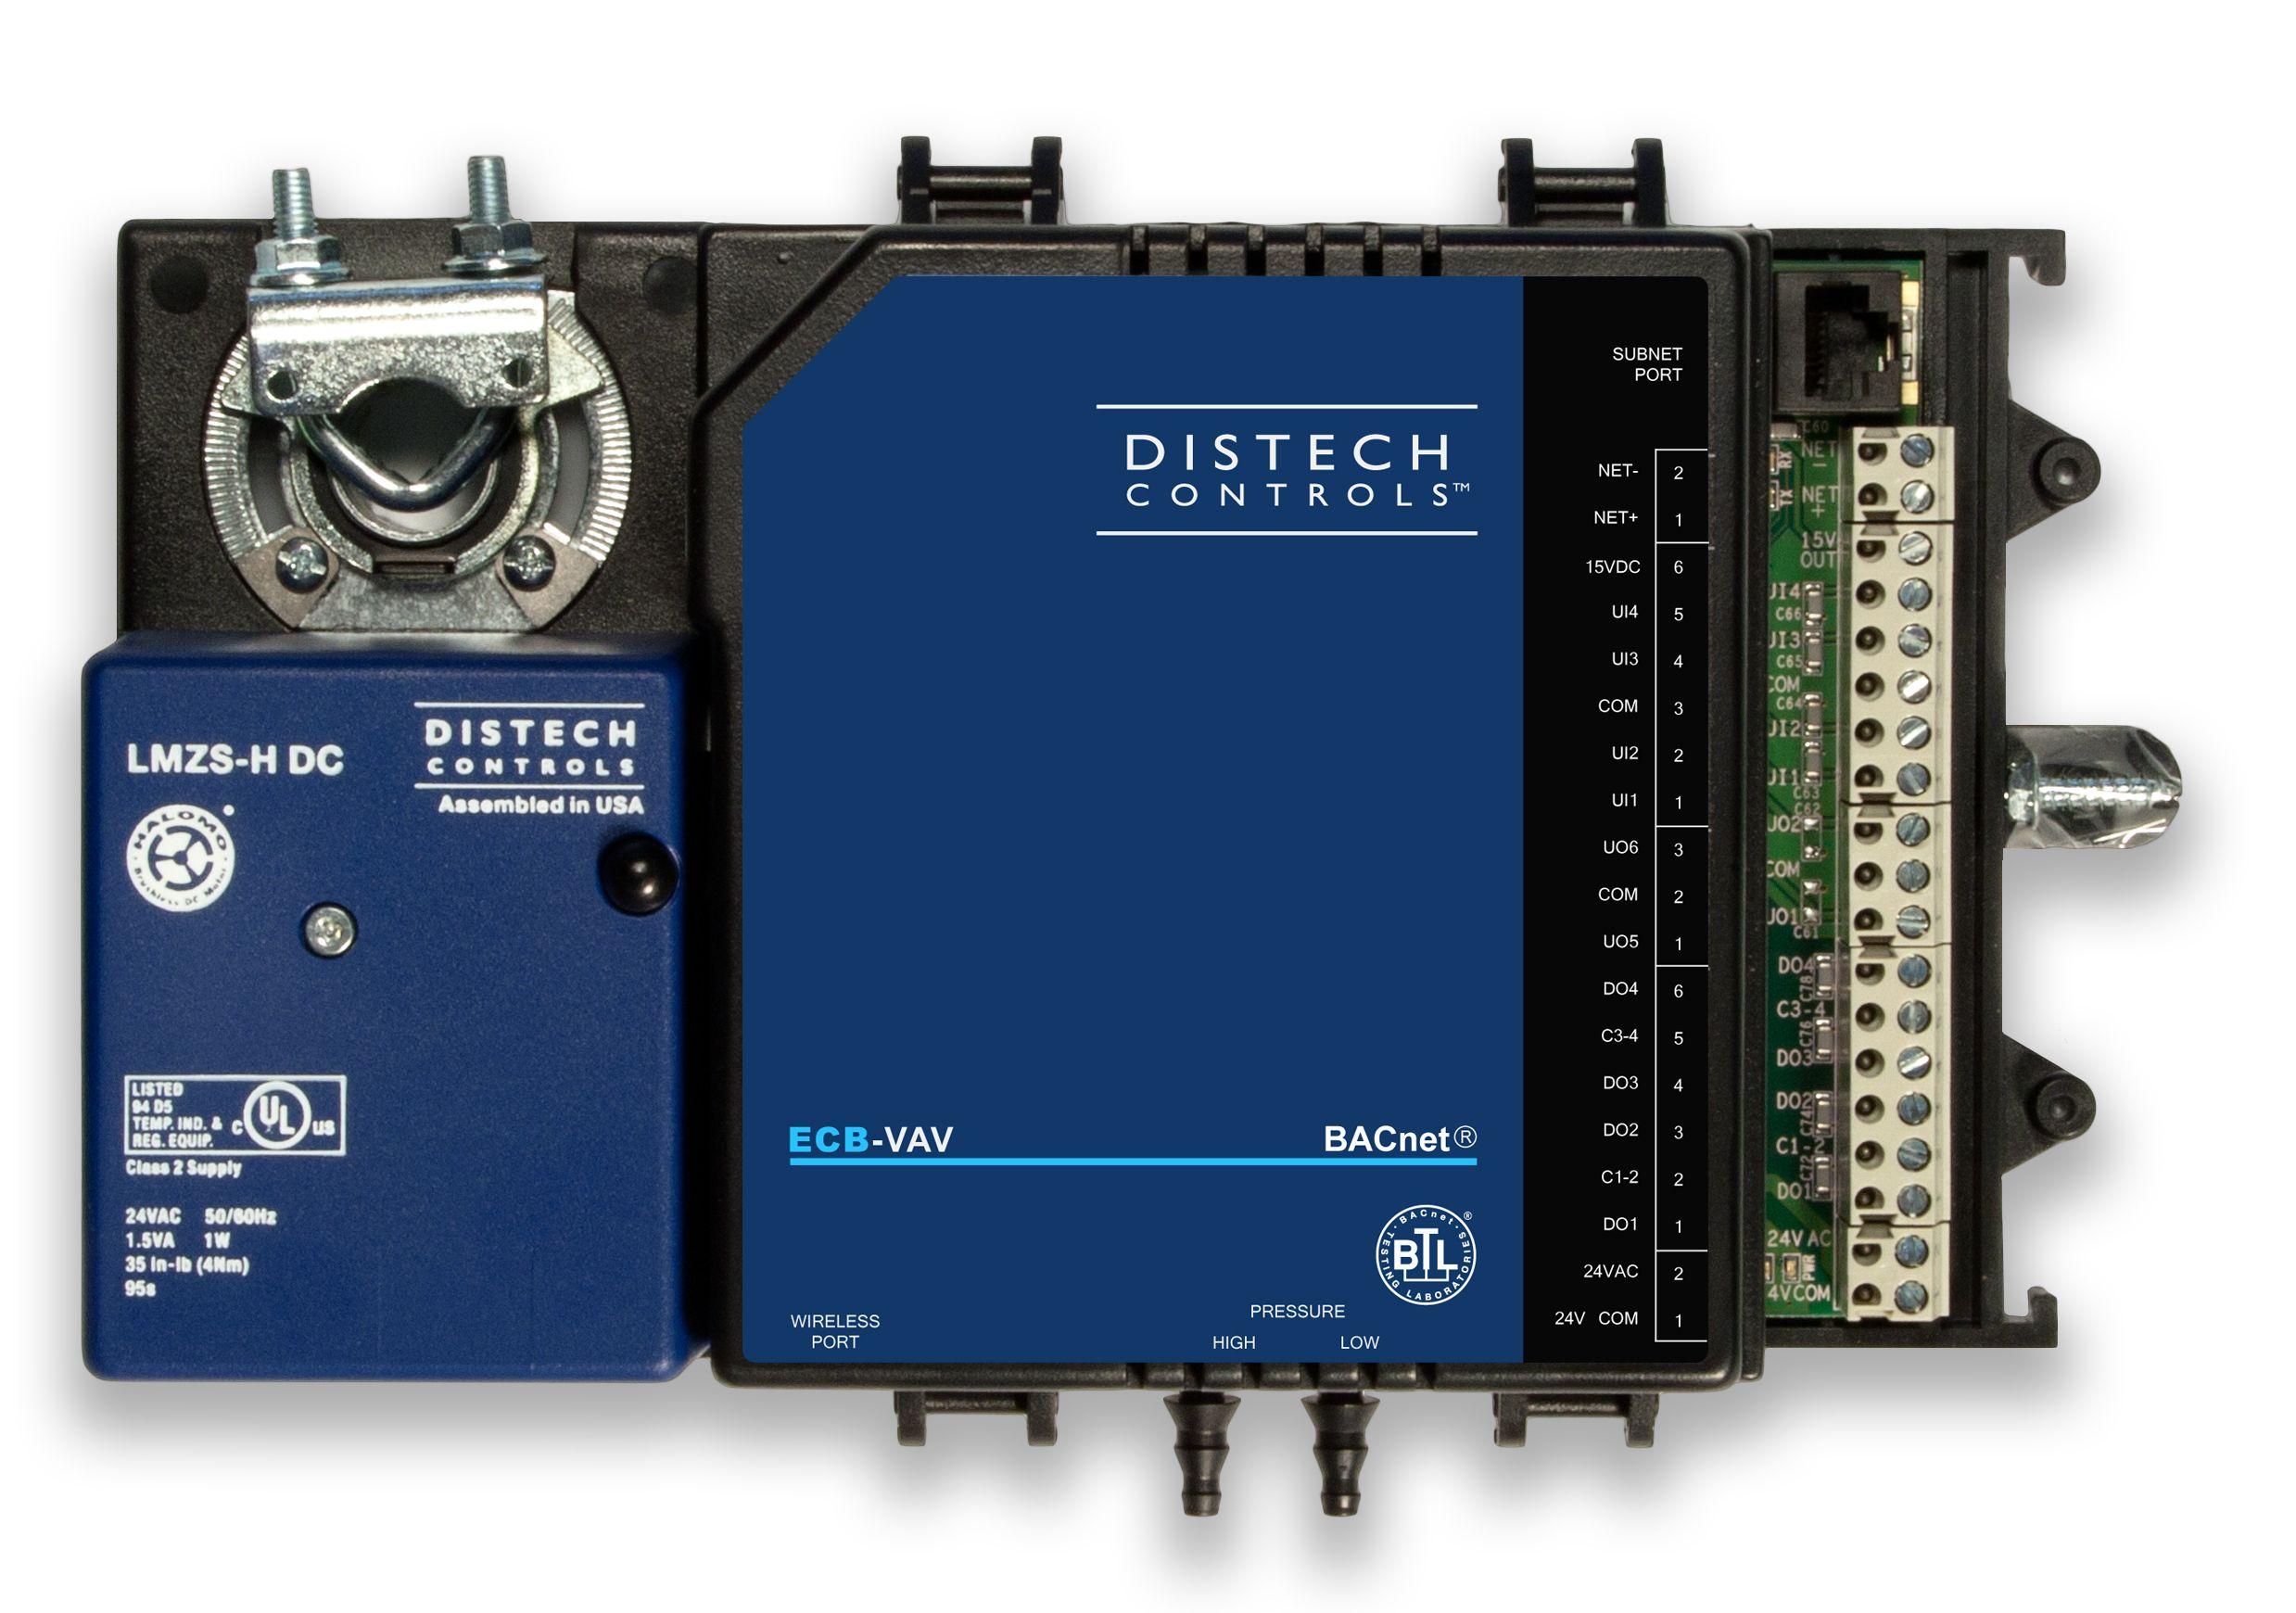 Distech ECB-VAV with Bacnet